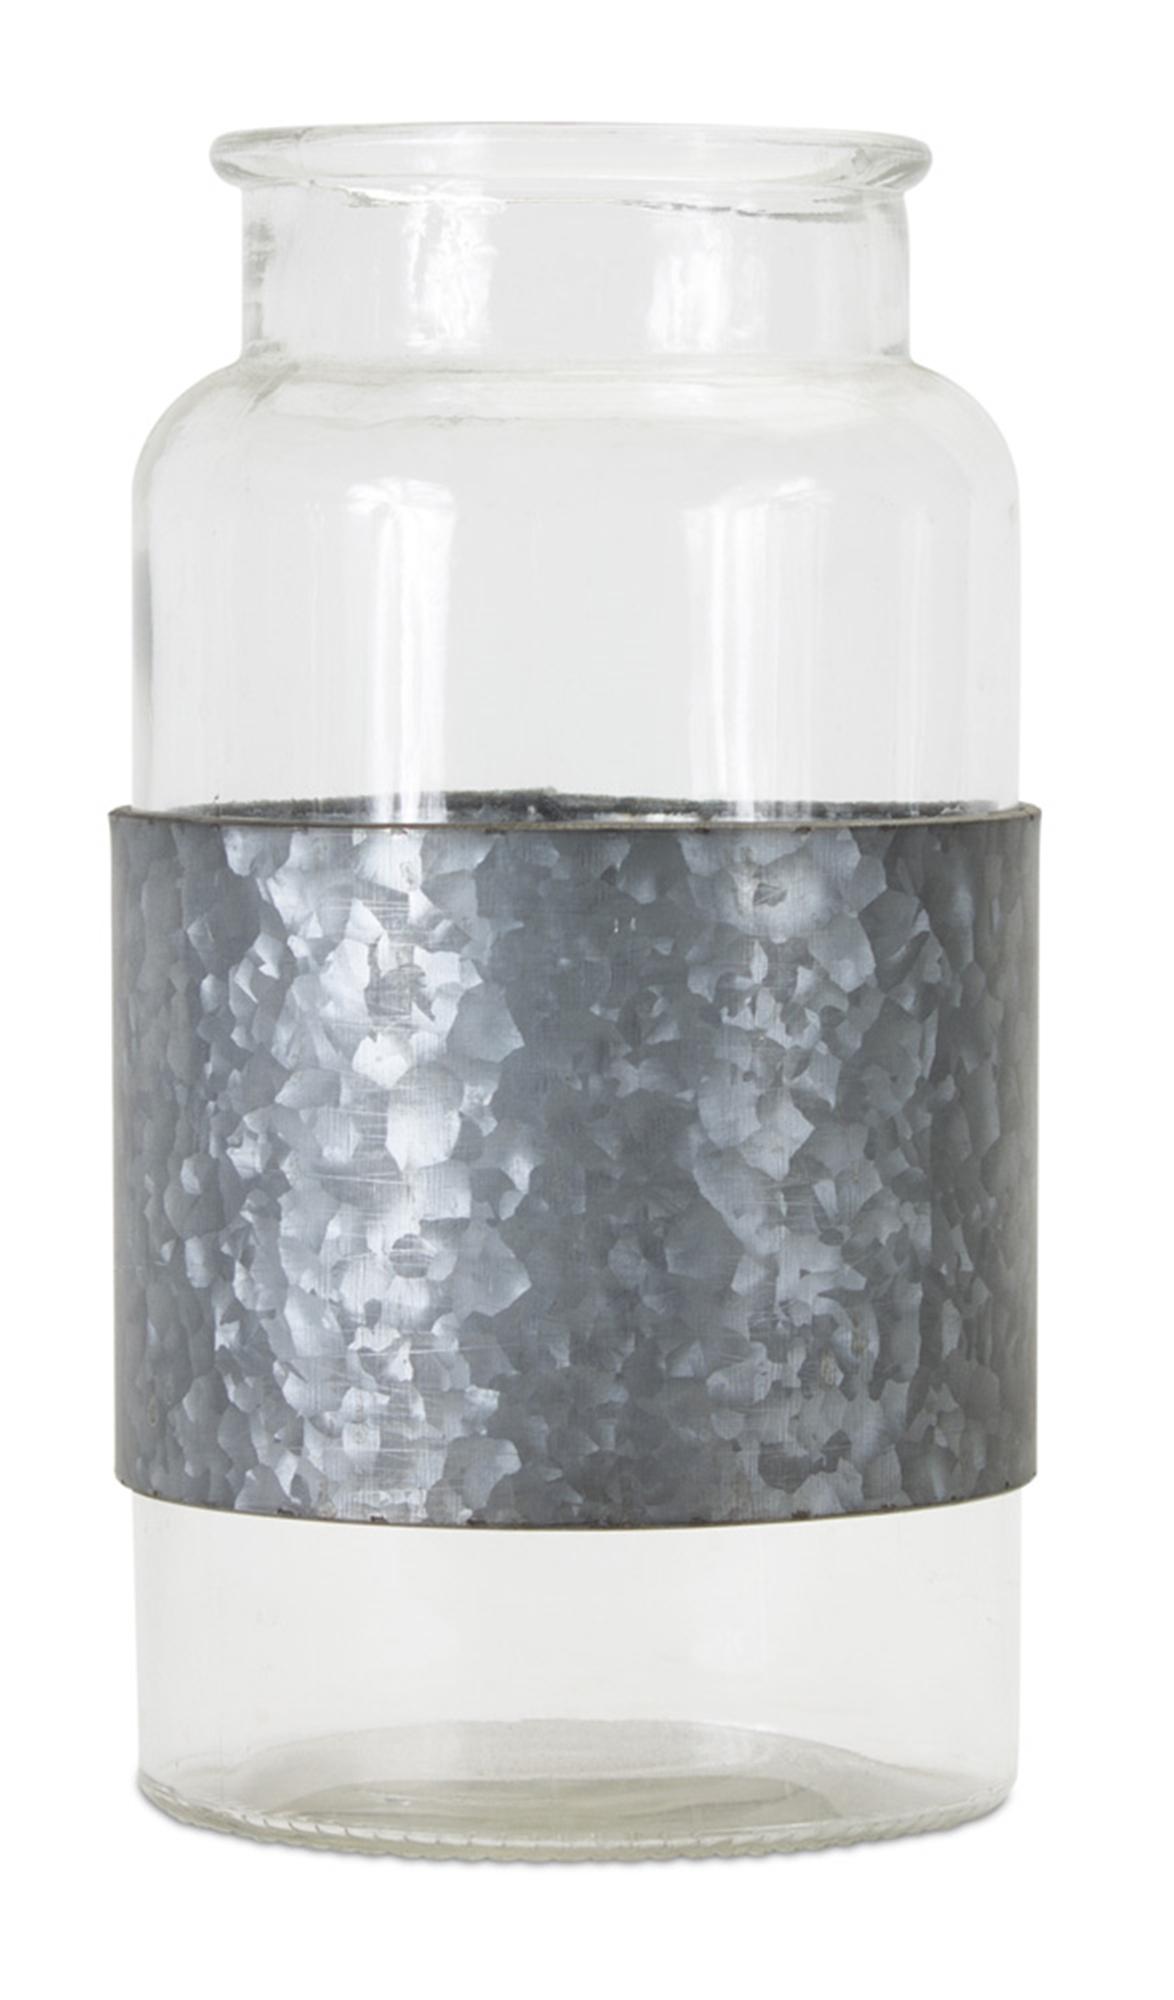 "Jar With Metal Wrap (Set of 2) 8"" x 12""H Glass/Iron"